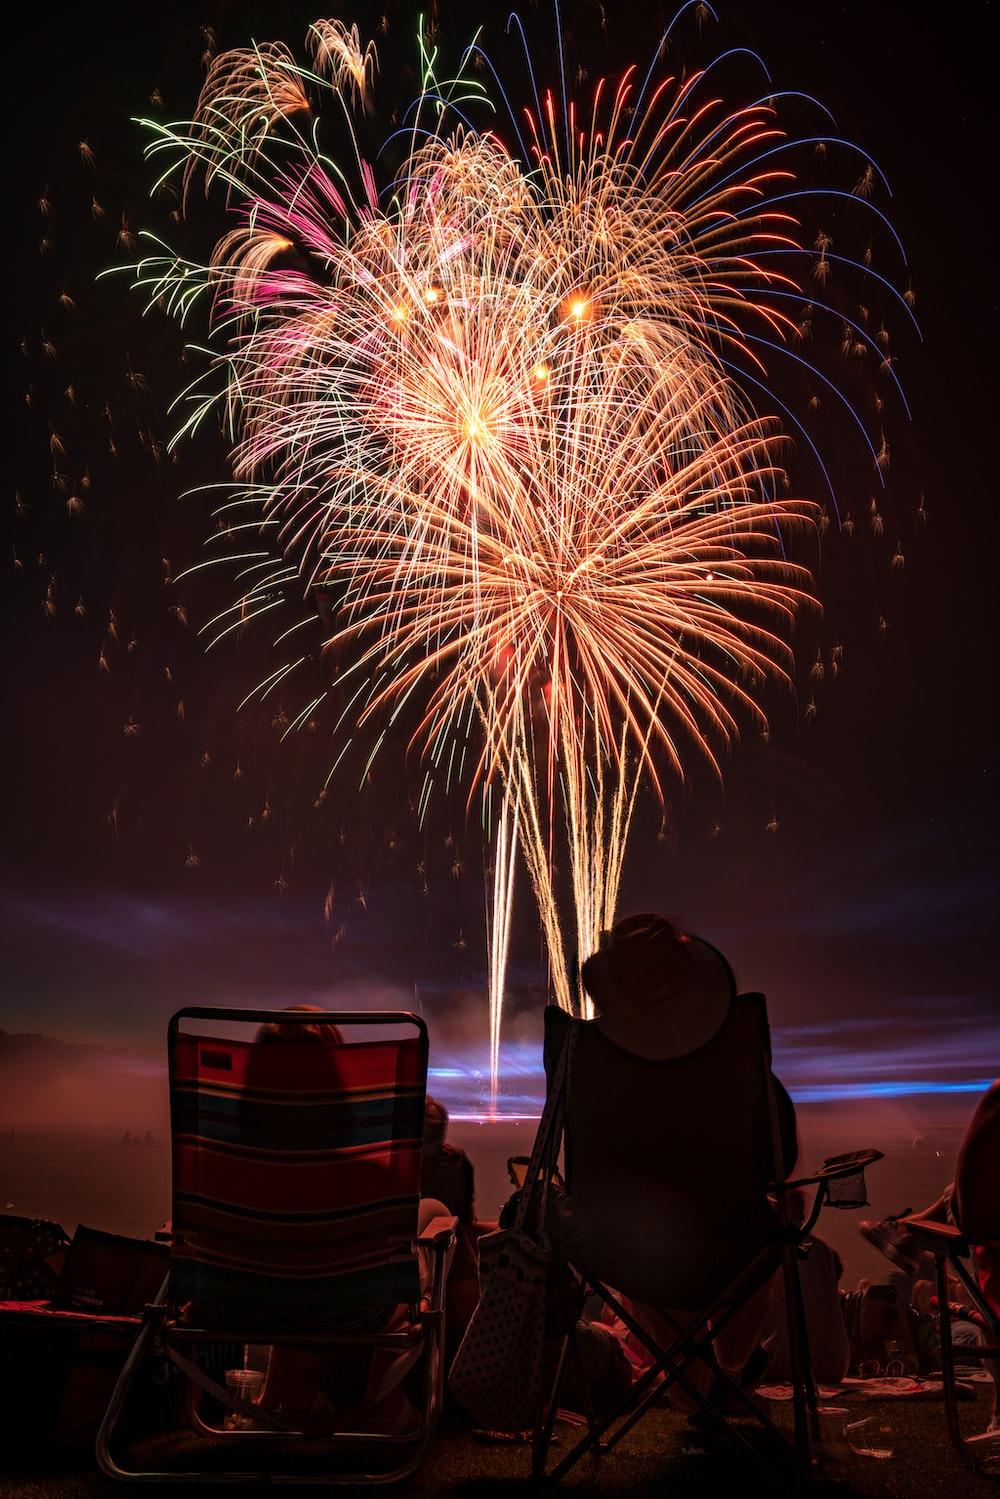 two people watching fireworks display